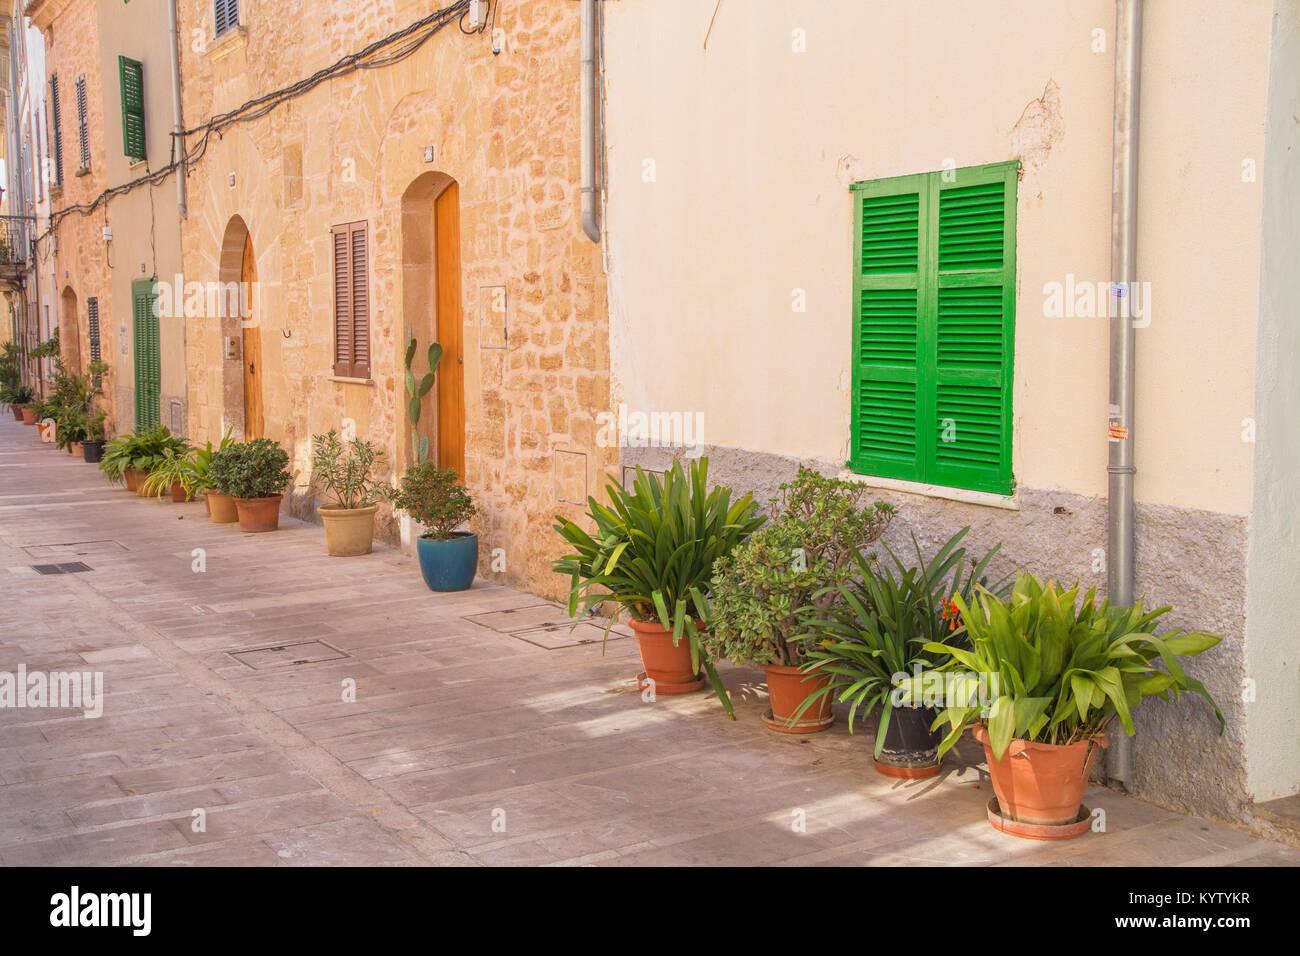 Straßen der Altstadt von Alcudia, Alcudia, Mallorca, Balearen, Spanien, Europa Stockfoto